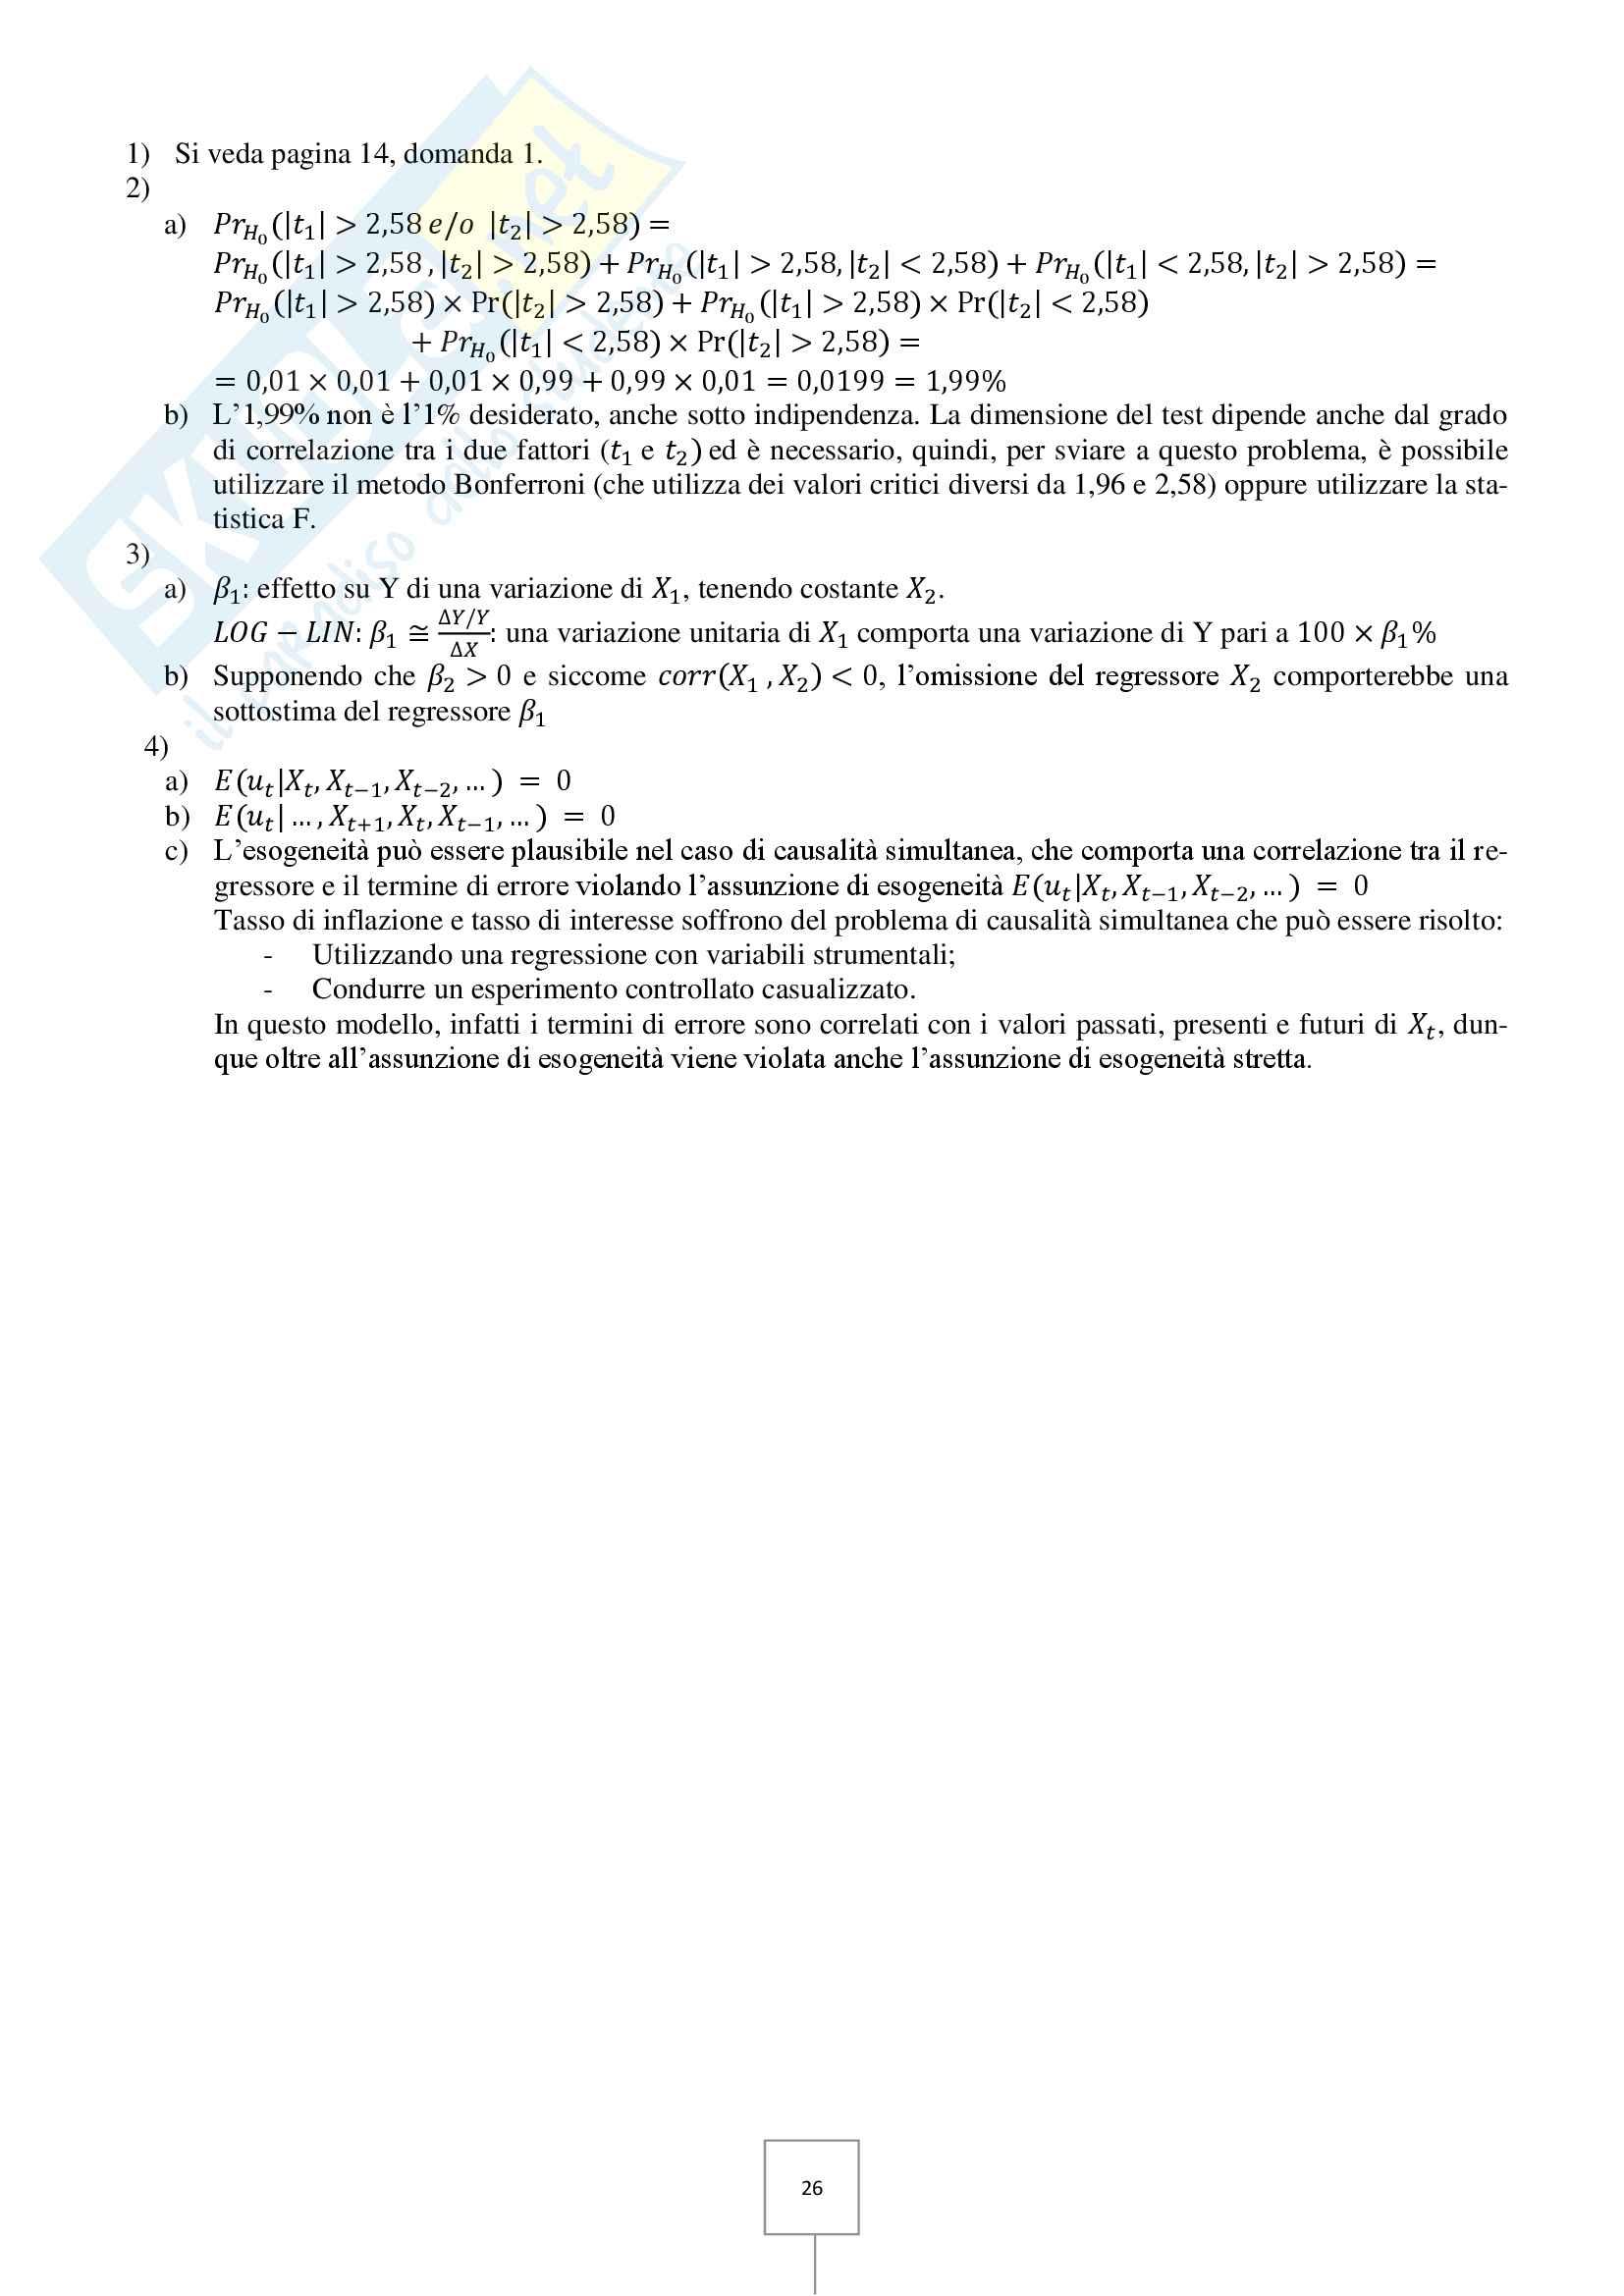 Econometria - Prove d'esame risolte Pag. 26